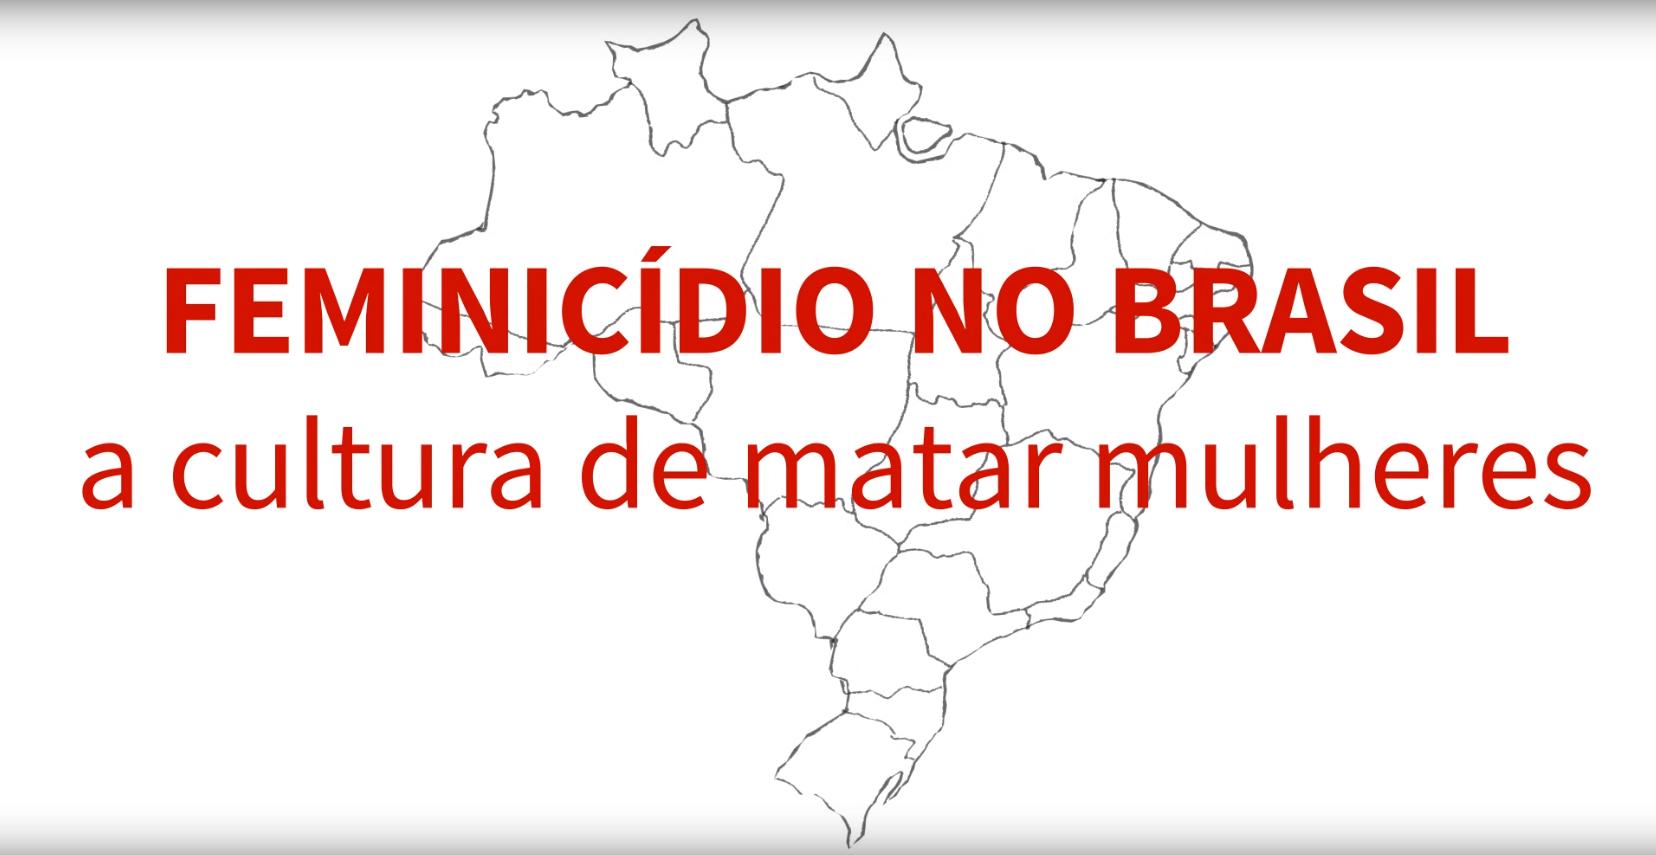 feminicidio-no-brasil